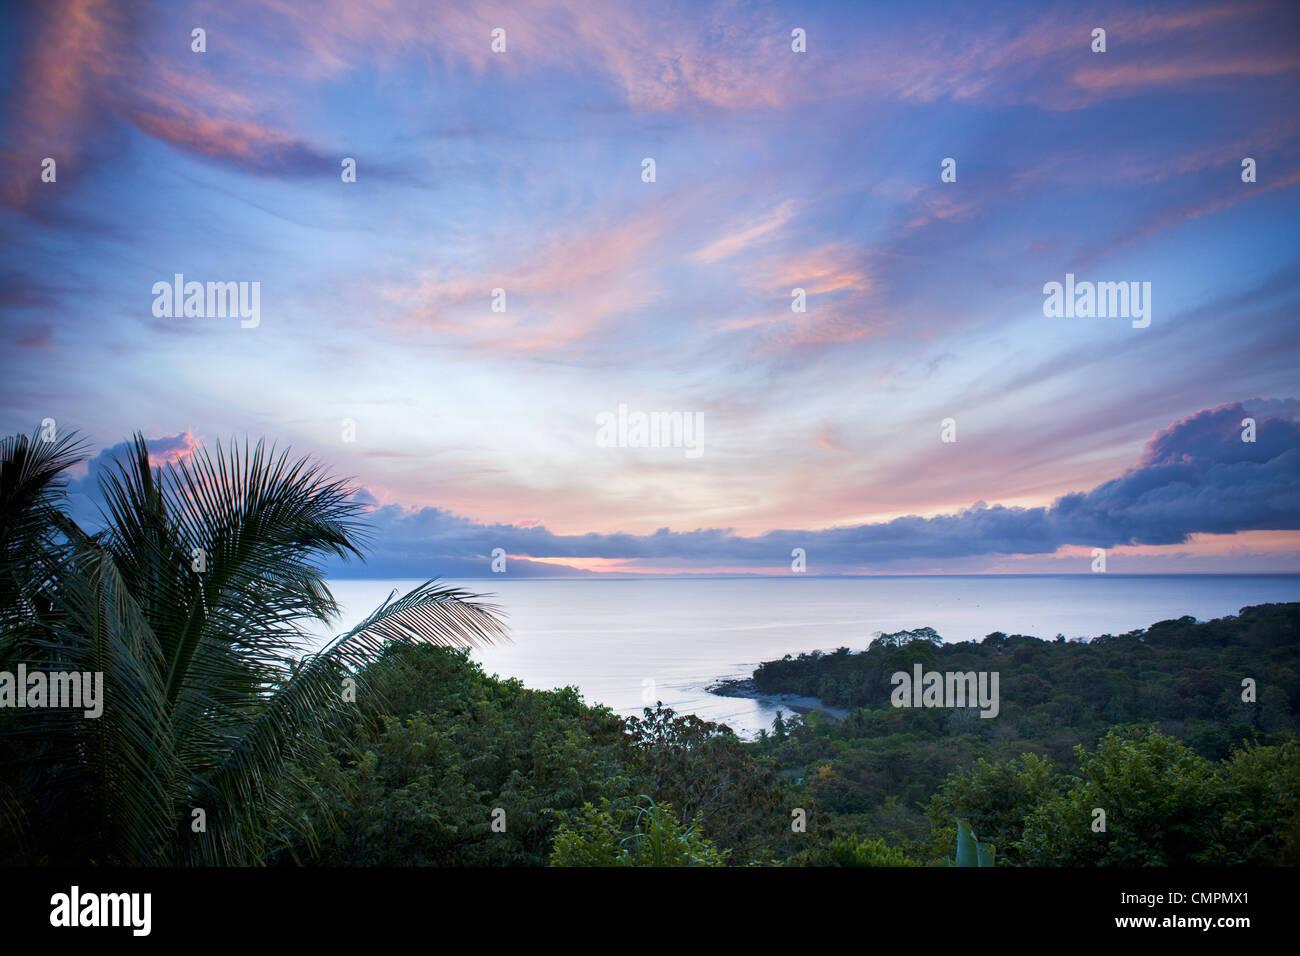 Sunrise in the jungle at Lapa Rios nature reserve on the Osa Peninsula, Costa Rica, Central America - Stock Image